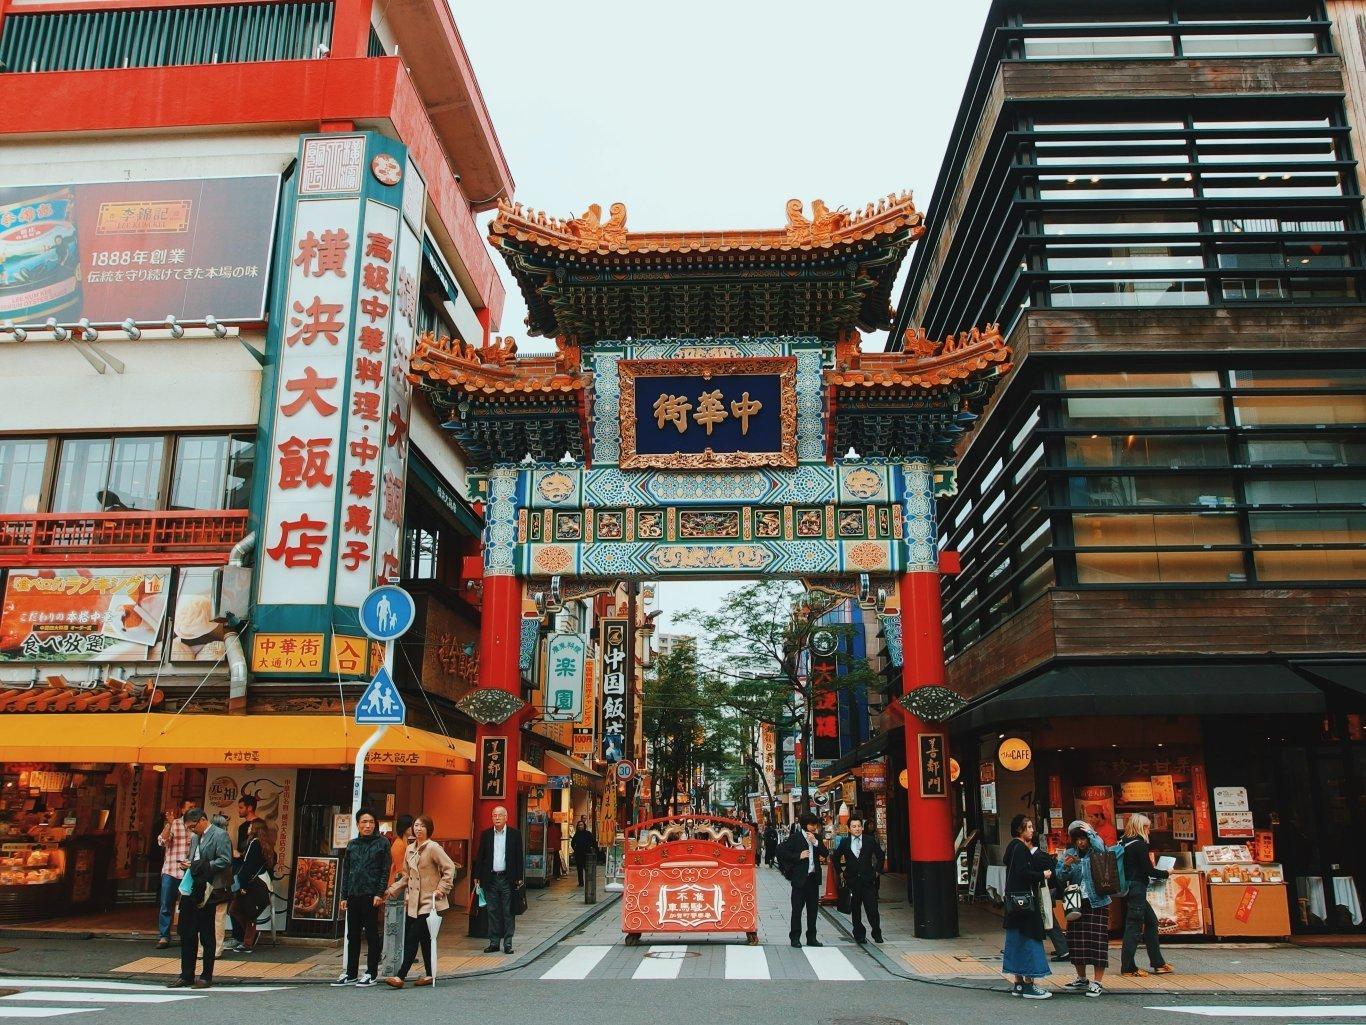 1-Day Yokohama Private Tour - Japan Itinerary